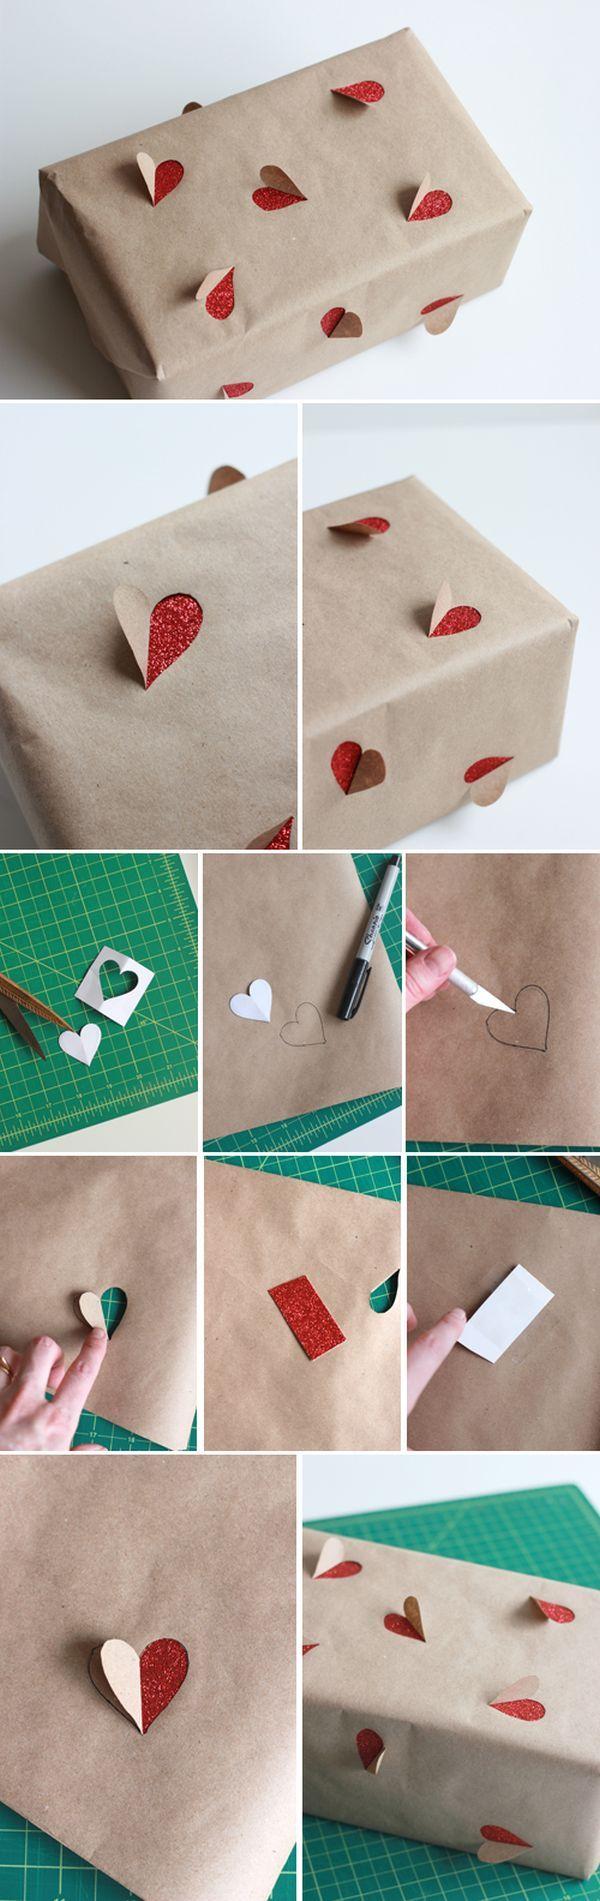 упаковка подарка сердечками